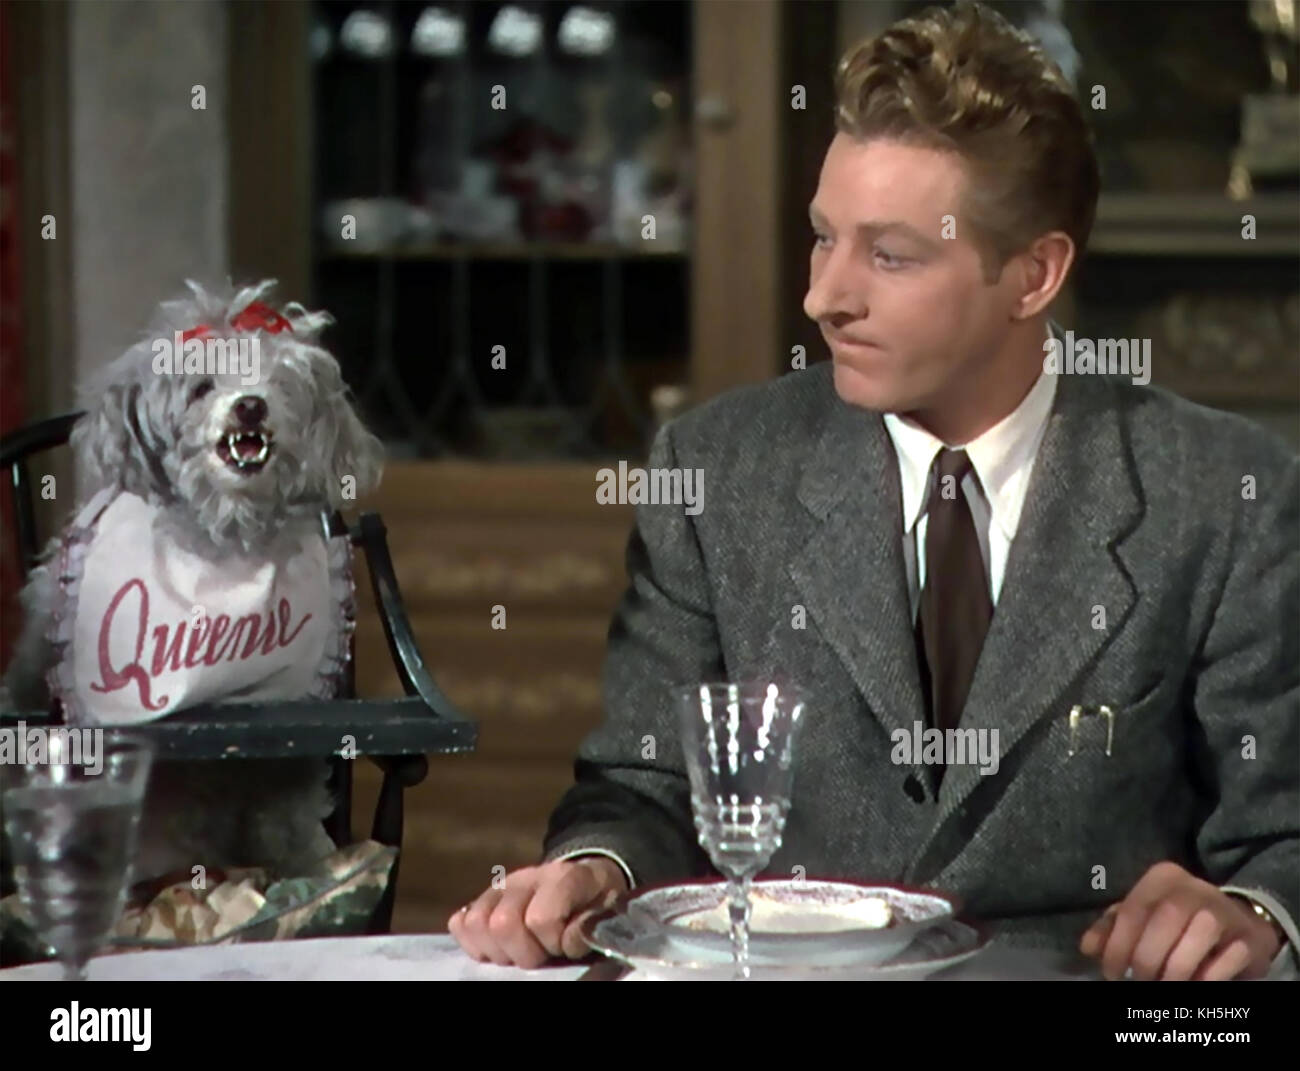 THE SECRET LIFE OF WALTER MITTY 1947 Samuel Goldwyn film with Danny Kaye - Stock Image